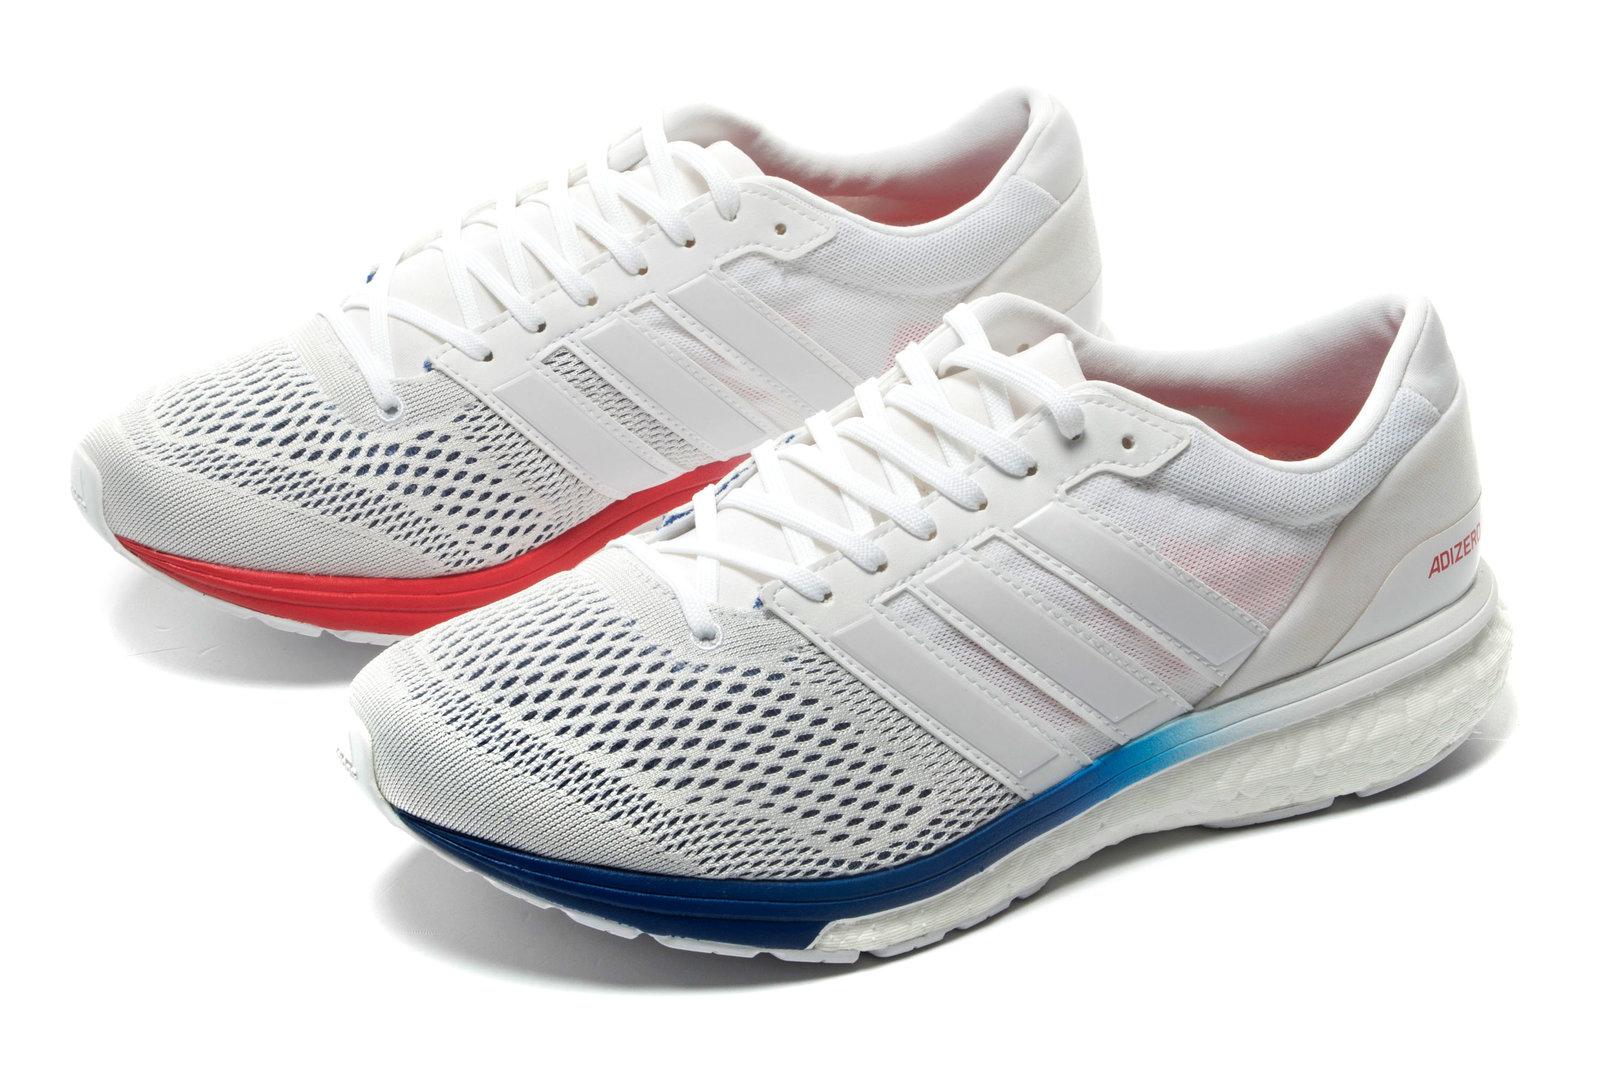 best wholesaler d8963 21488 adidas Mens adizero Boston 6 AKTIV Running Shoes Sports Trainers Navy